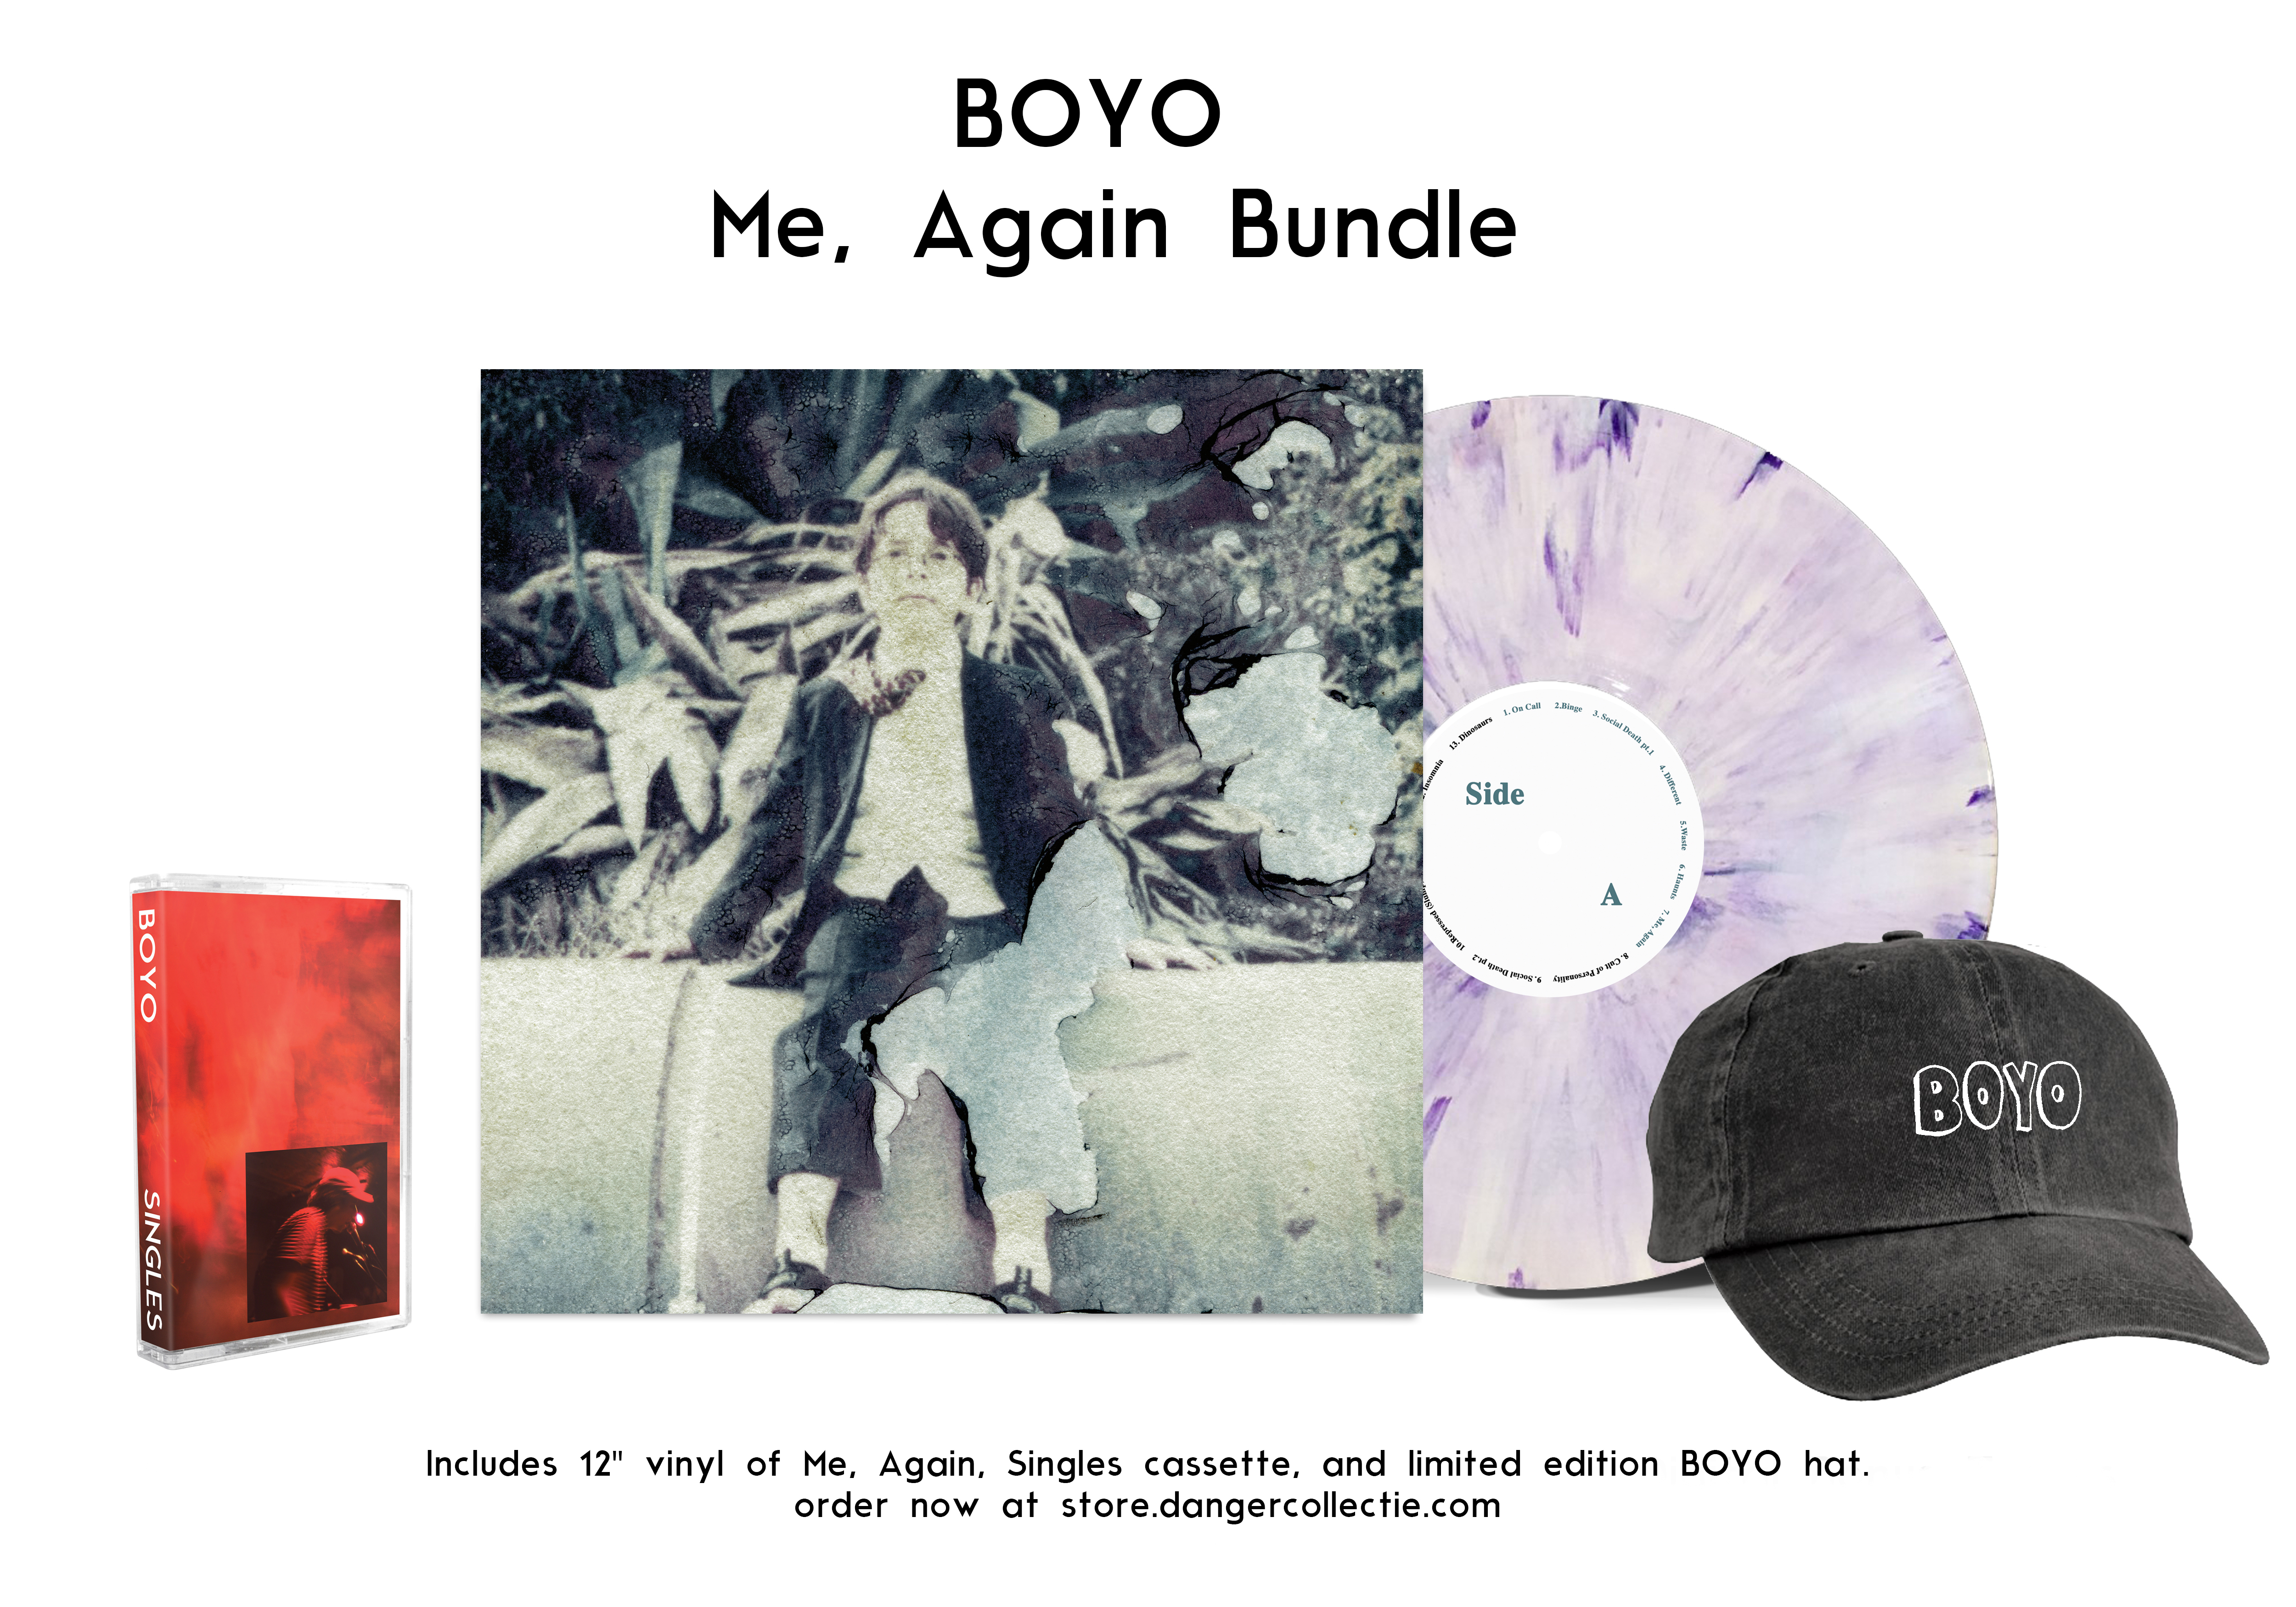 BOYO - Me, Again